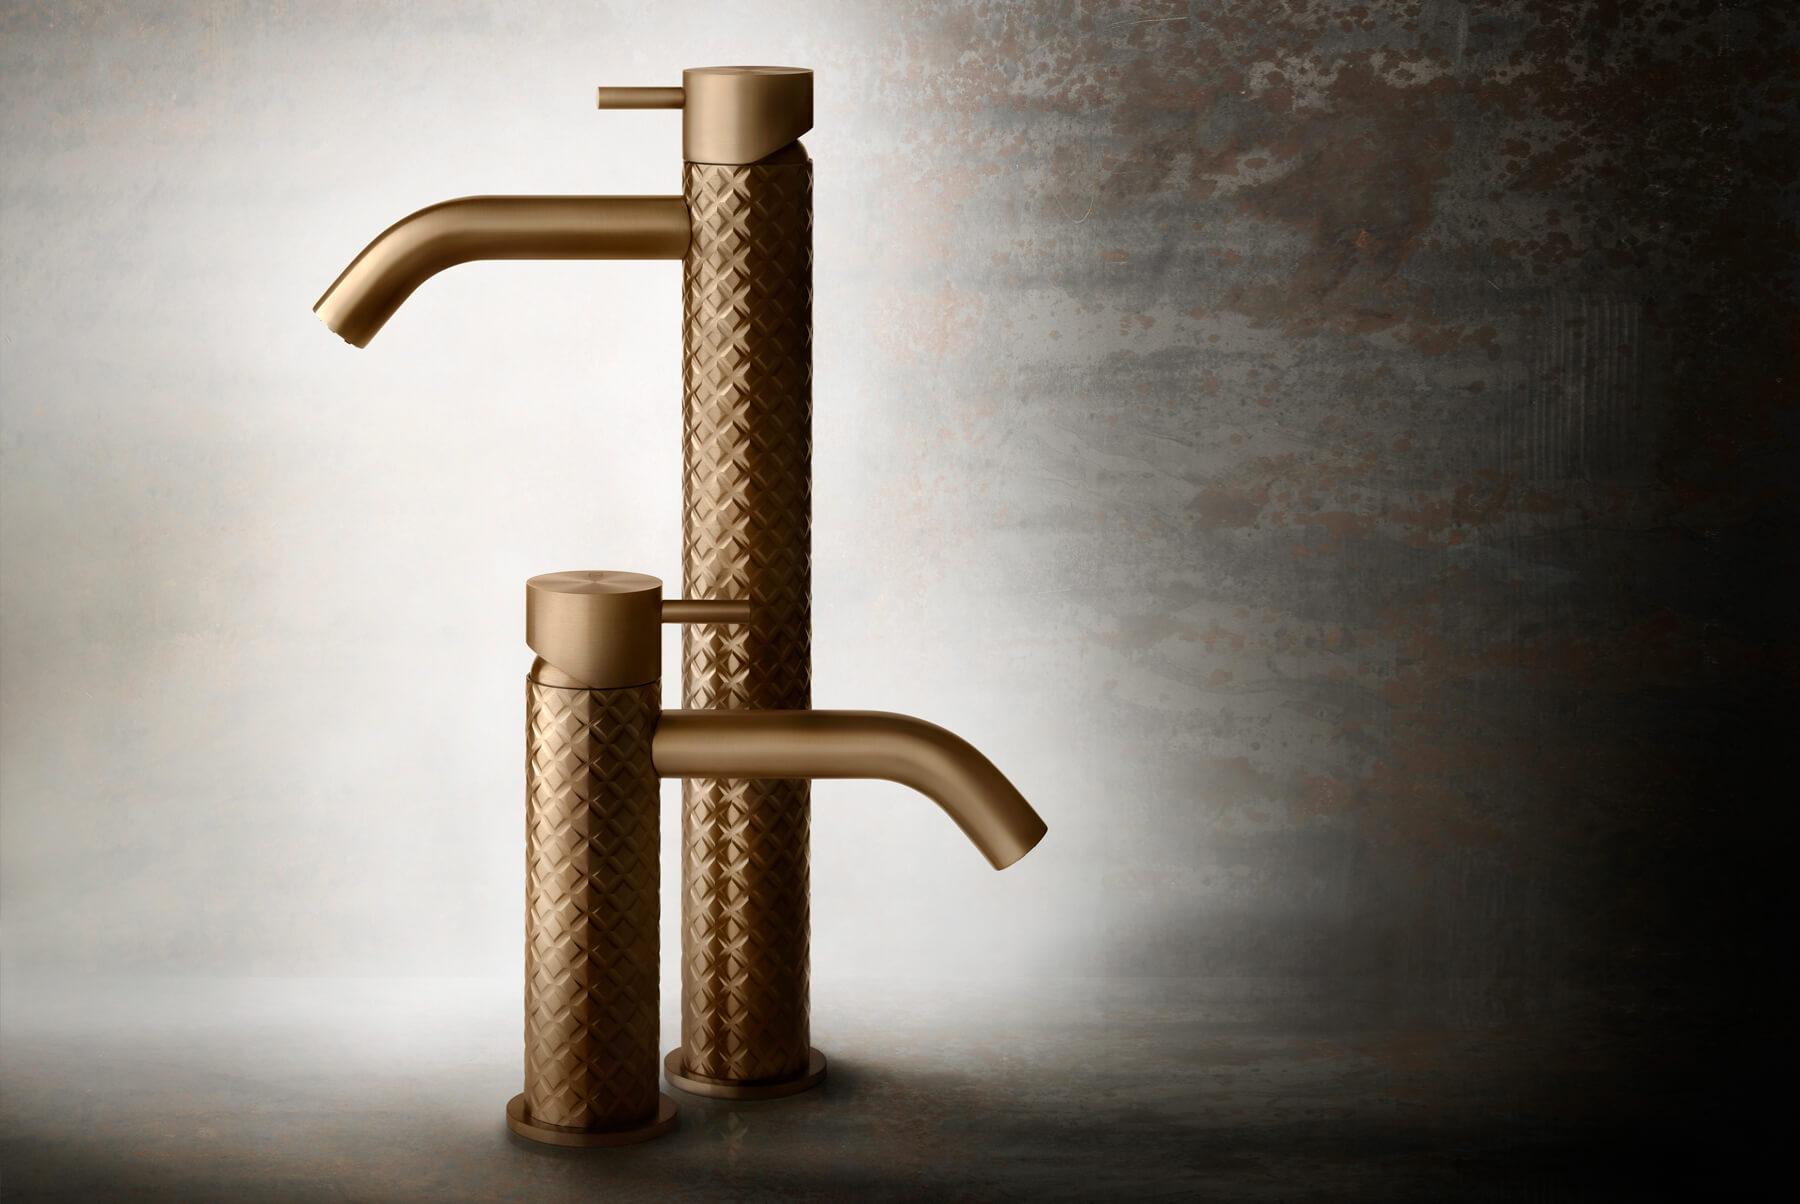 Brassware-GESSI-316-Inset-8-1800x1204